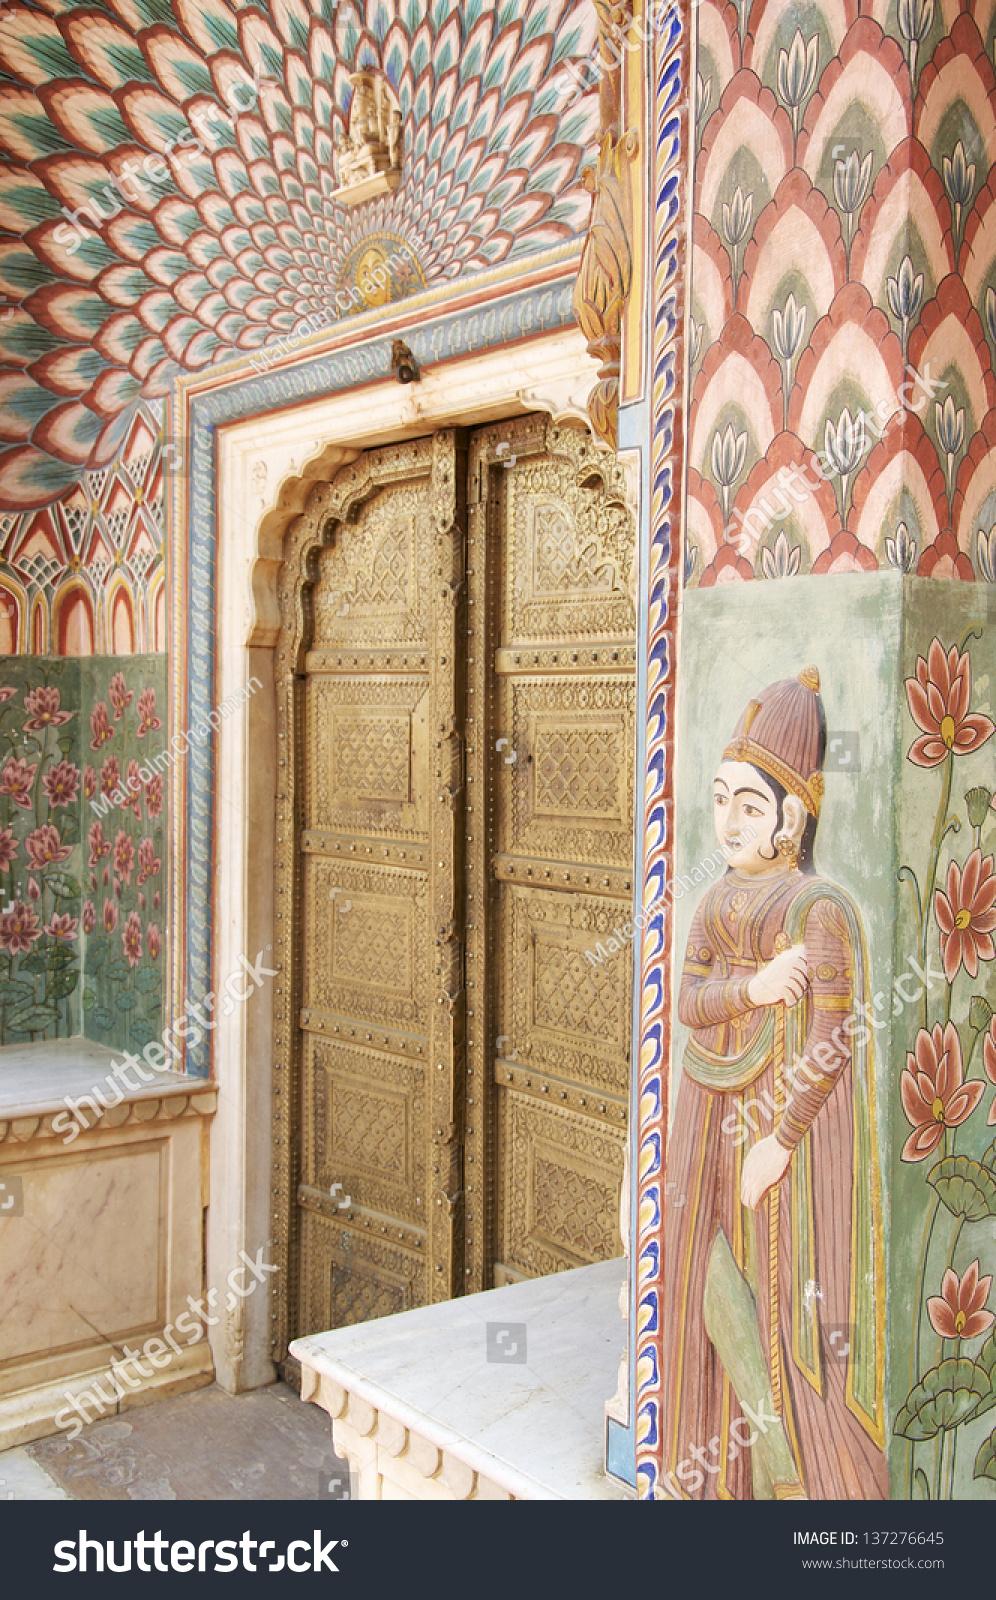 Lotus gate at the chandra mahal jaipur city palace for Decor india jaipur